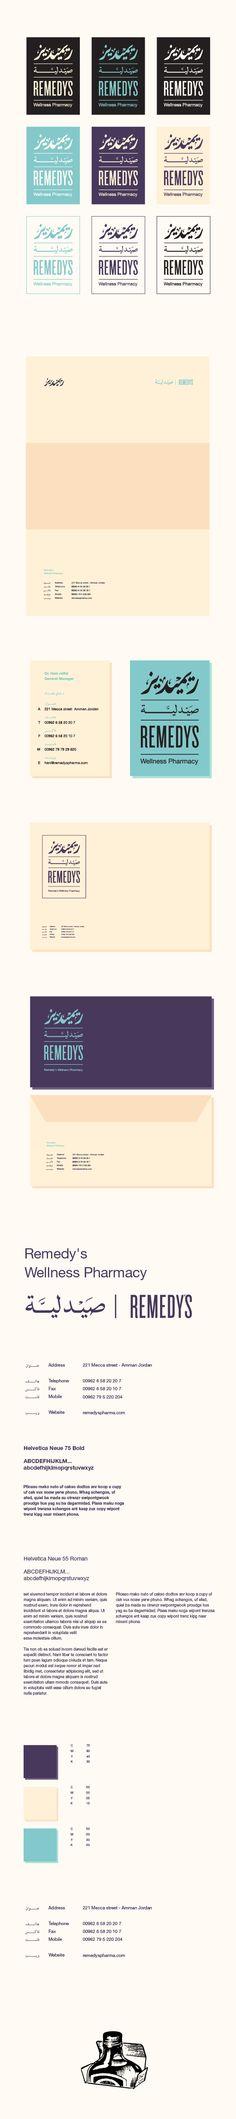 Remedy's Pharmacy on Branding Served